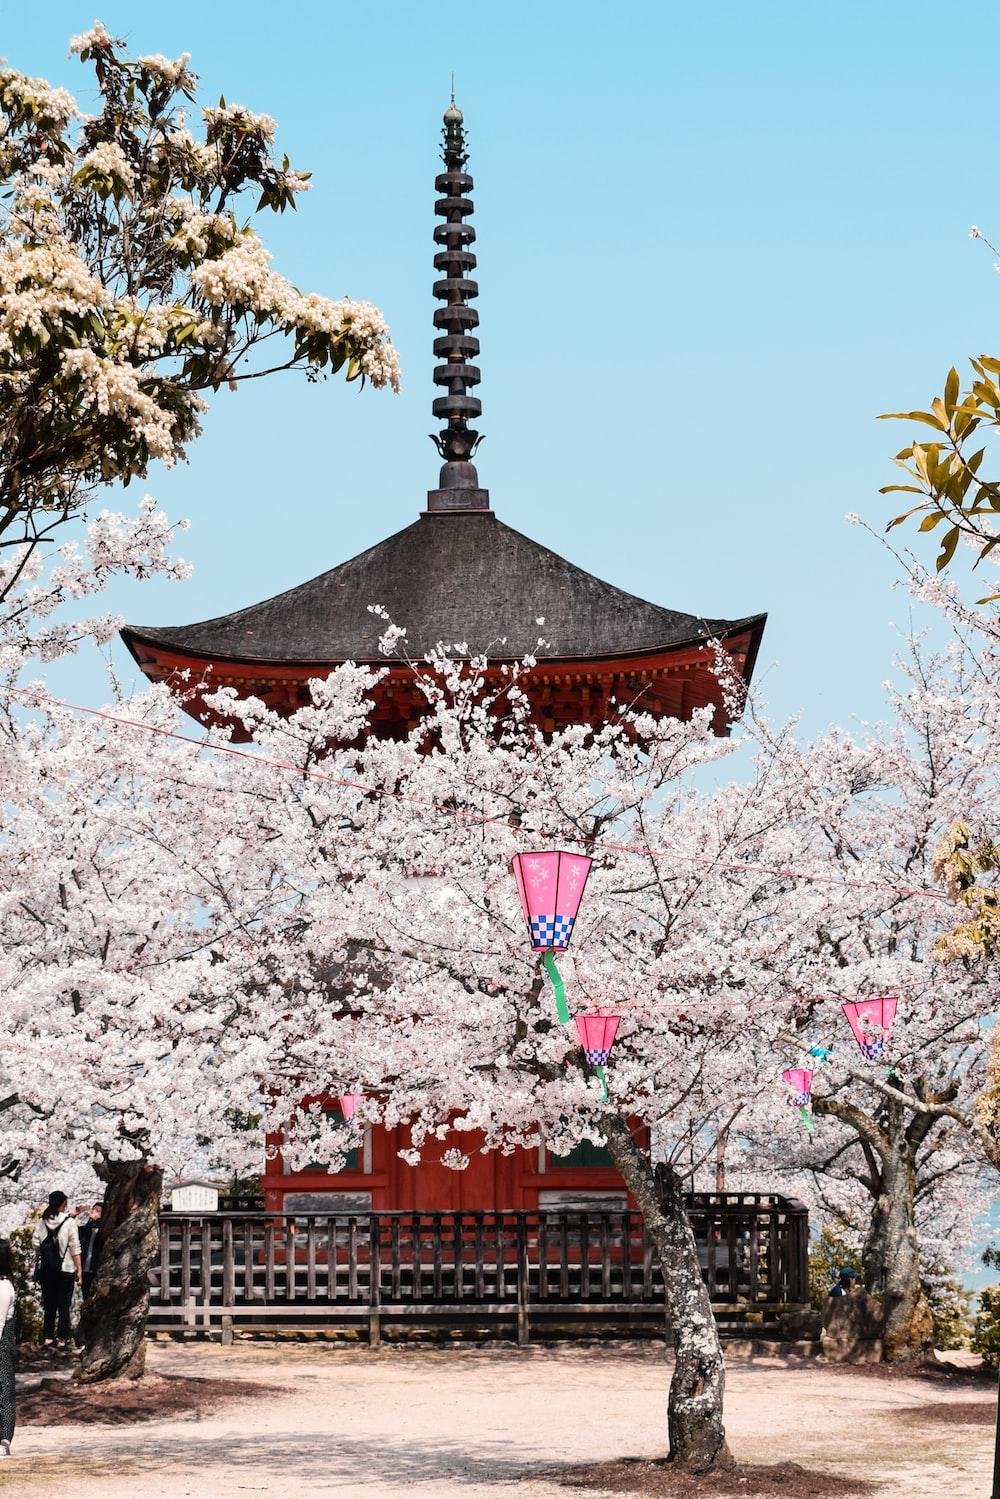 gray and red pagoda